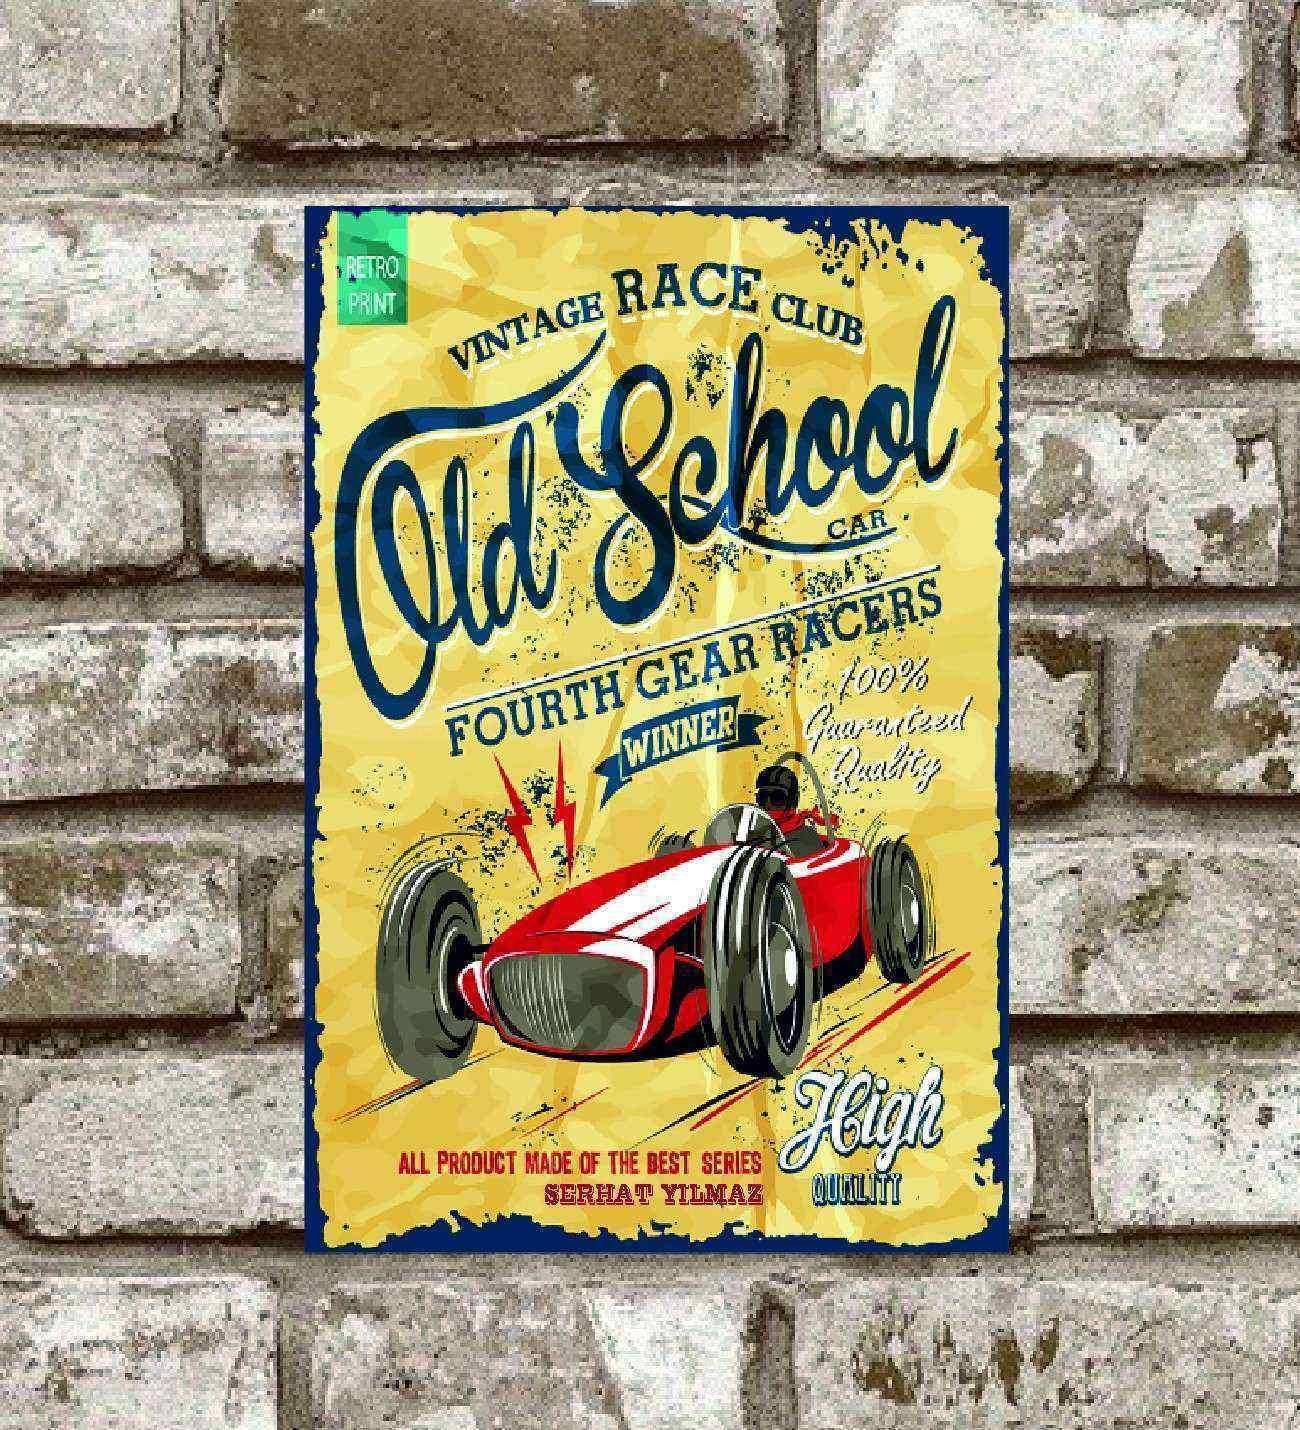 Kişiye Özel Metal Vıntage Race Club Old School Poster (29x19)